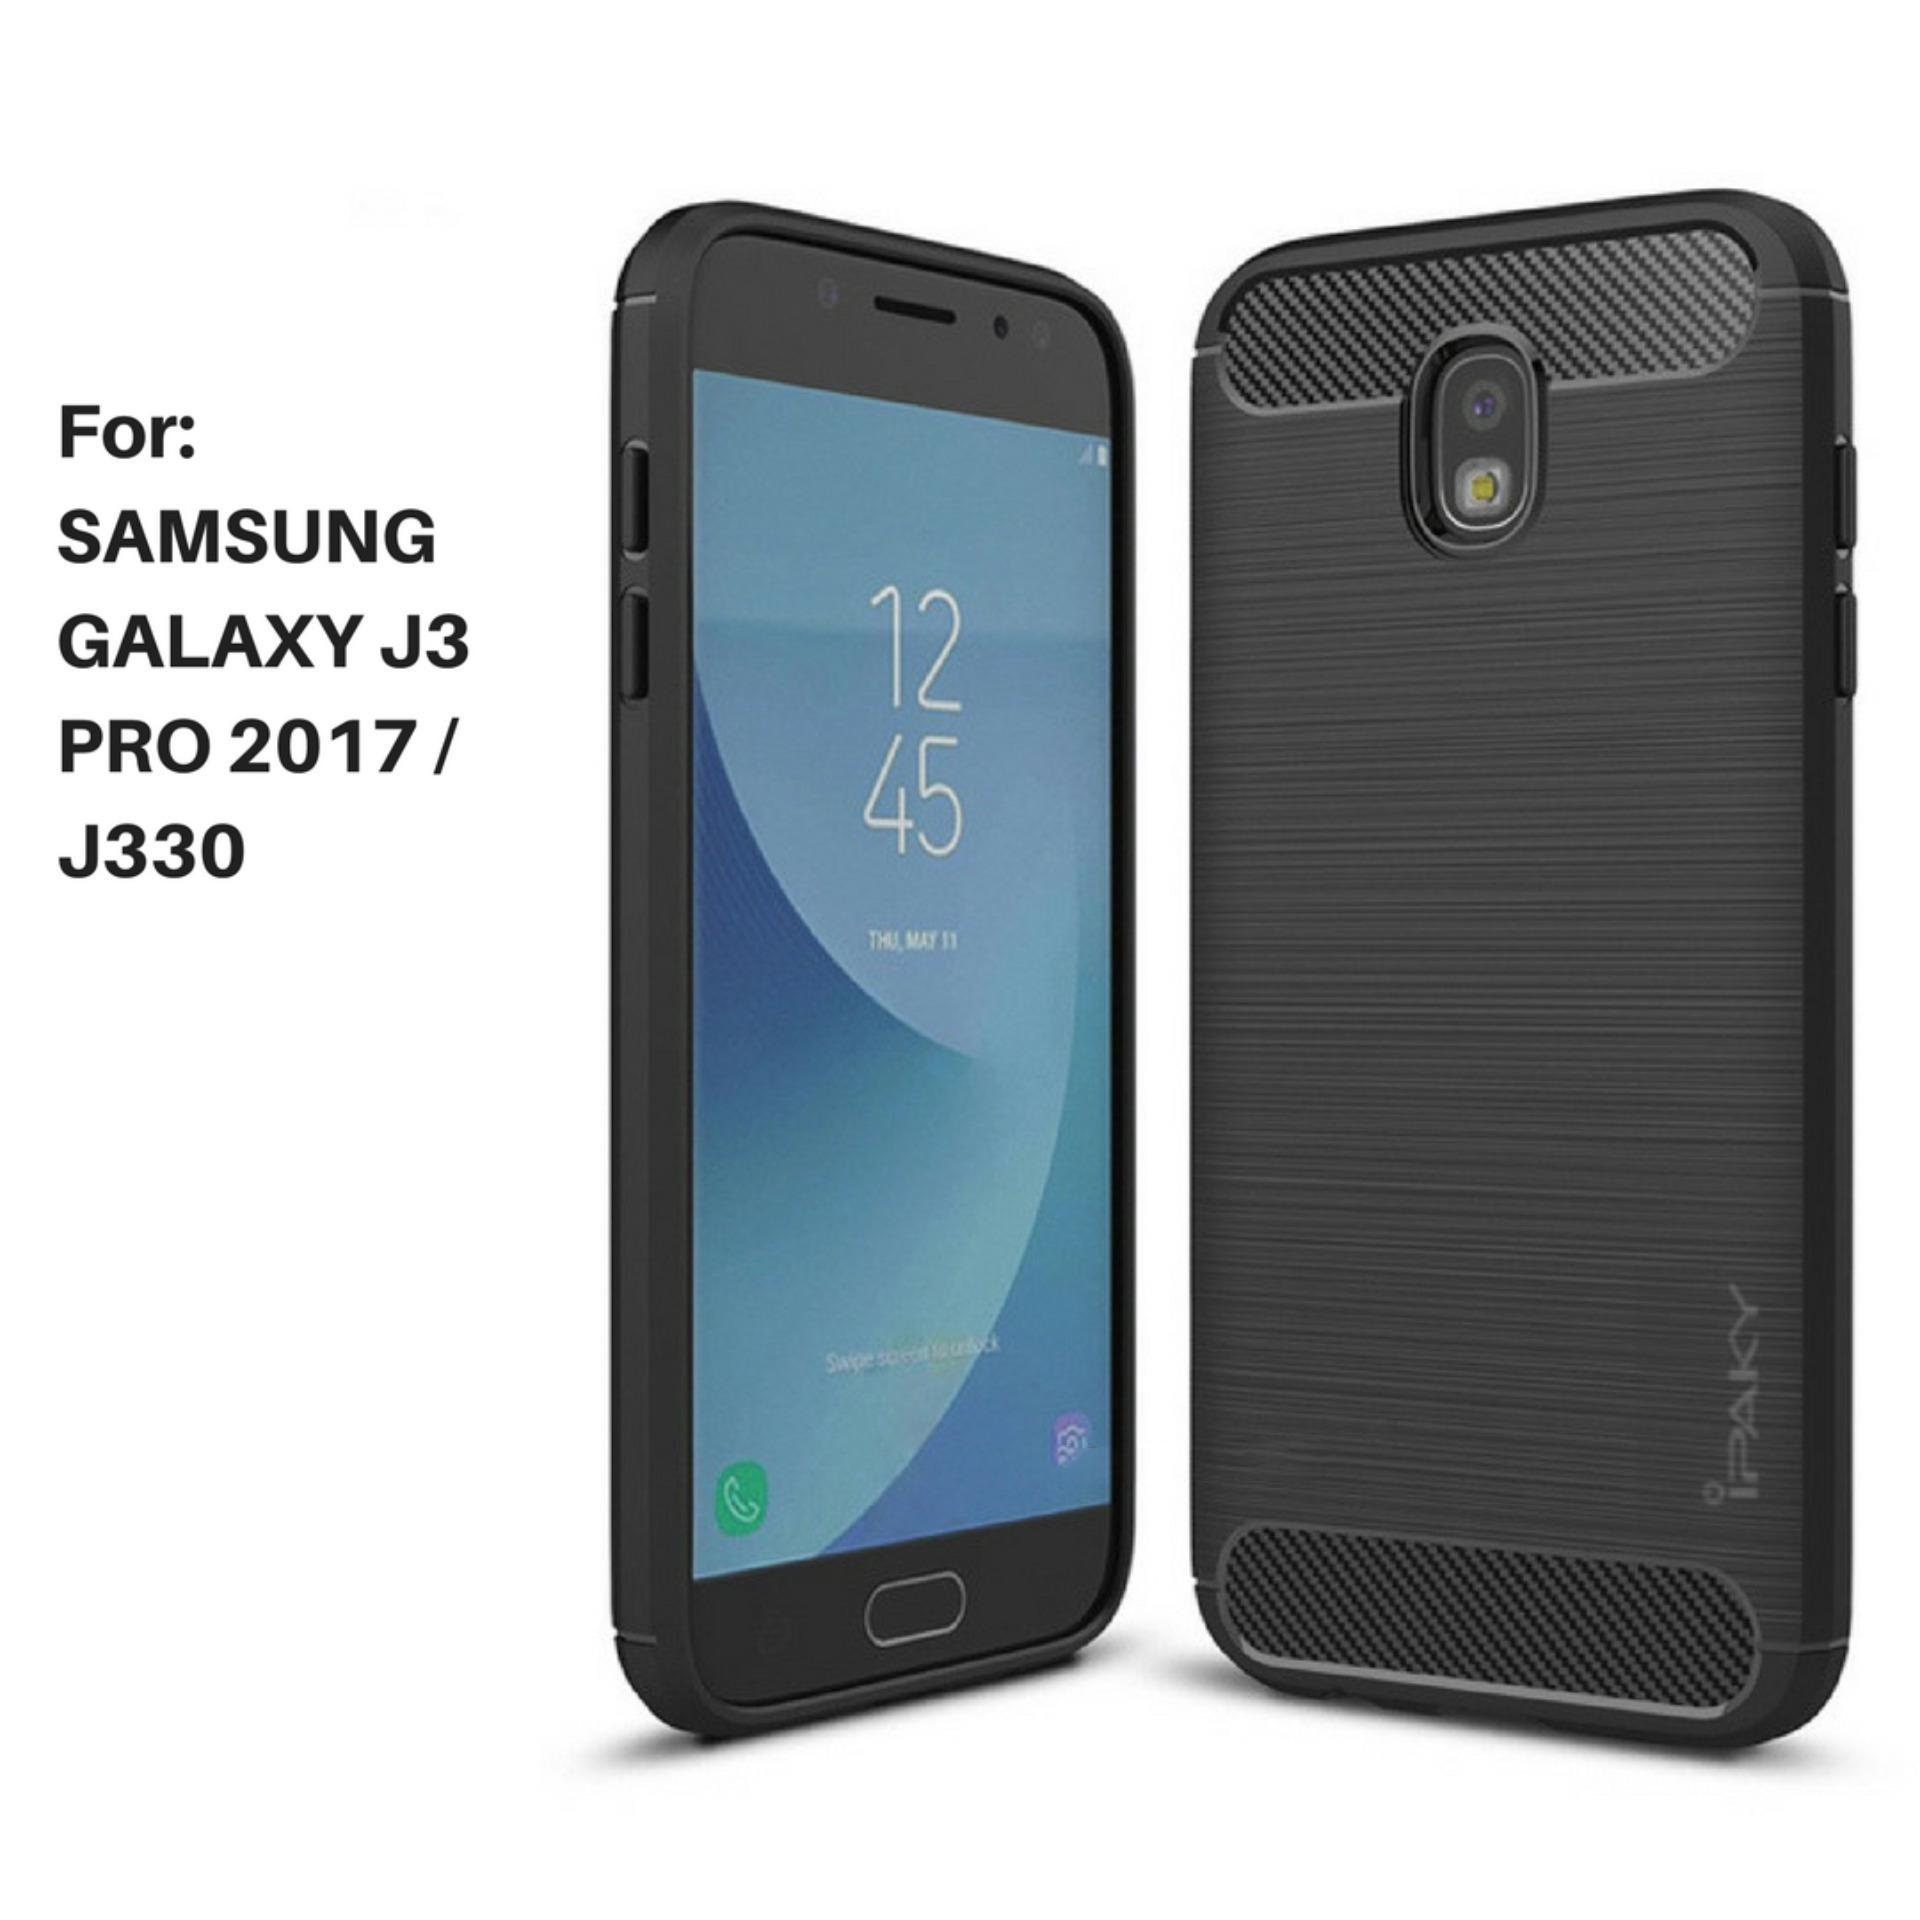 Armor Carbon Case for Samsung Galaxy J3 Pro 2017 / J330 - Black